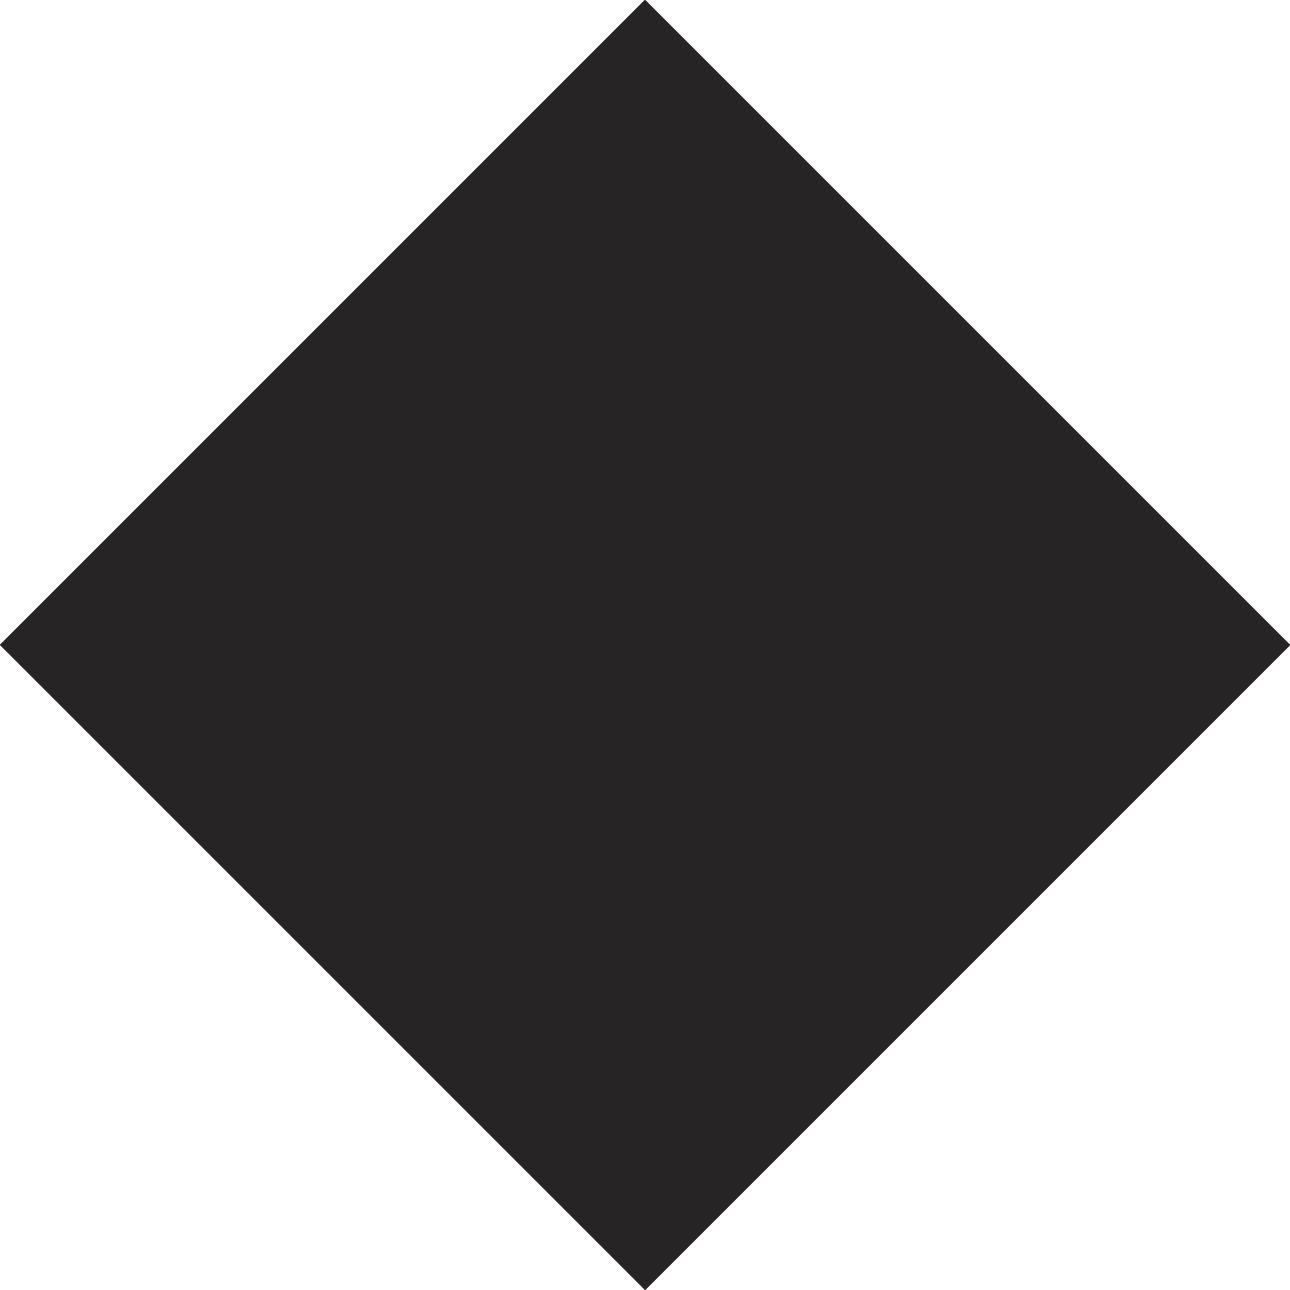 Diamond Shape Vector Png Diamond Vector Diamond Drawing Svg Shapes